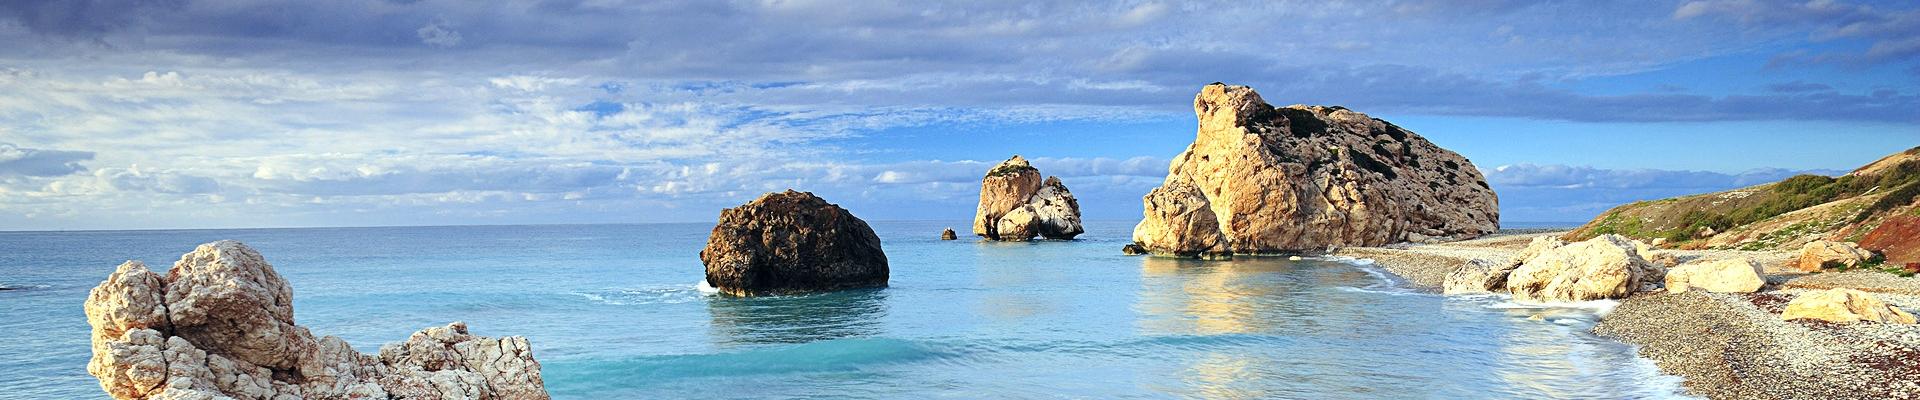 Sunnyshores Cyprus